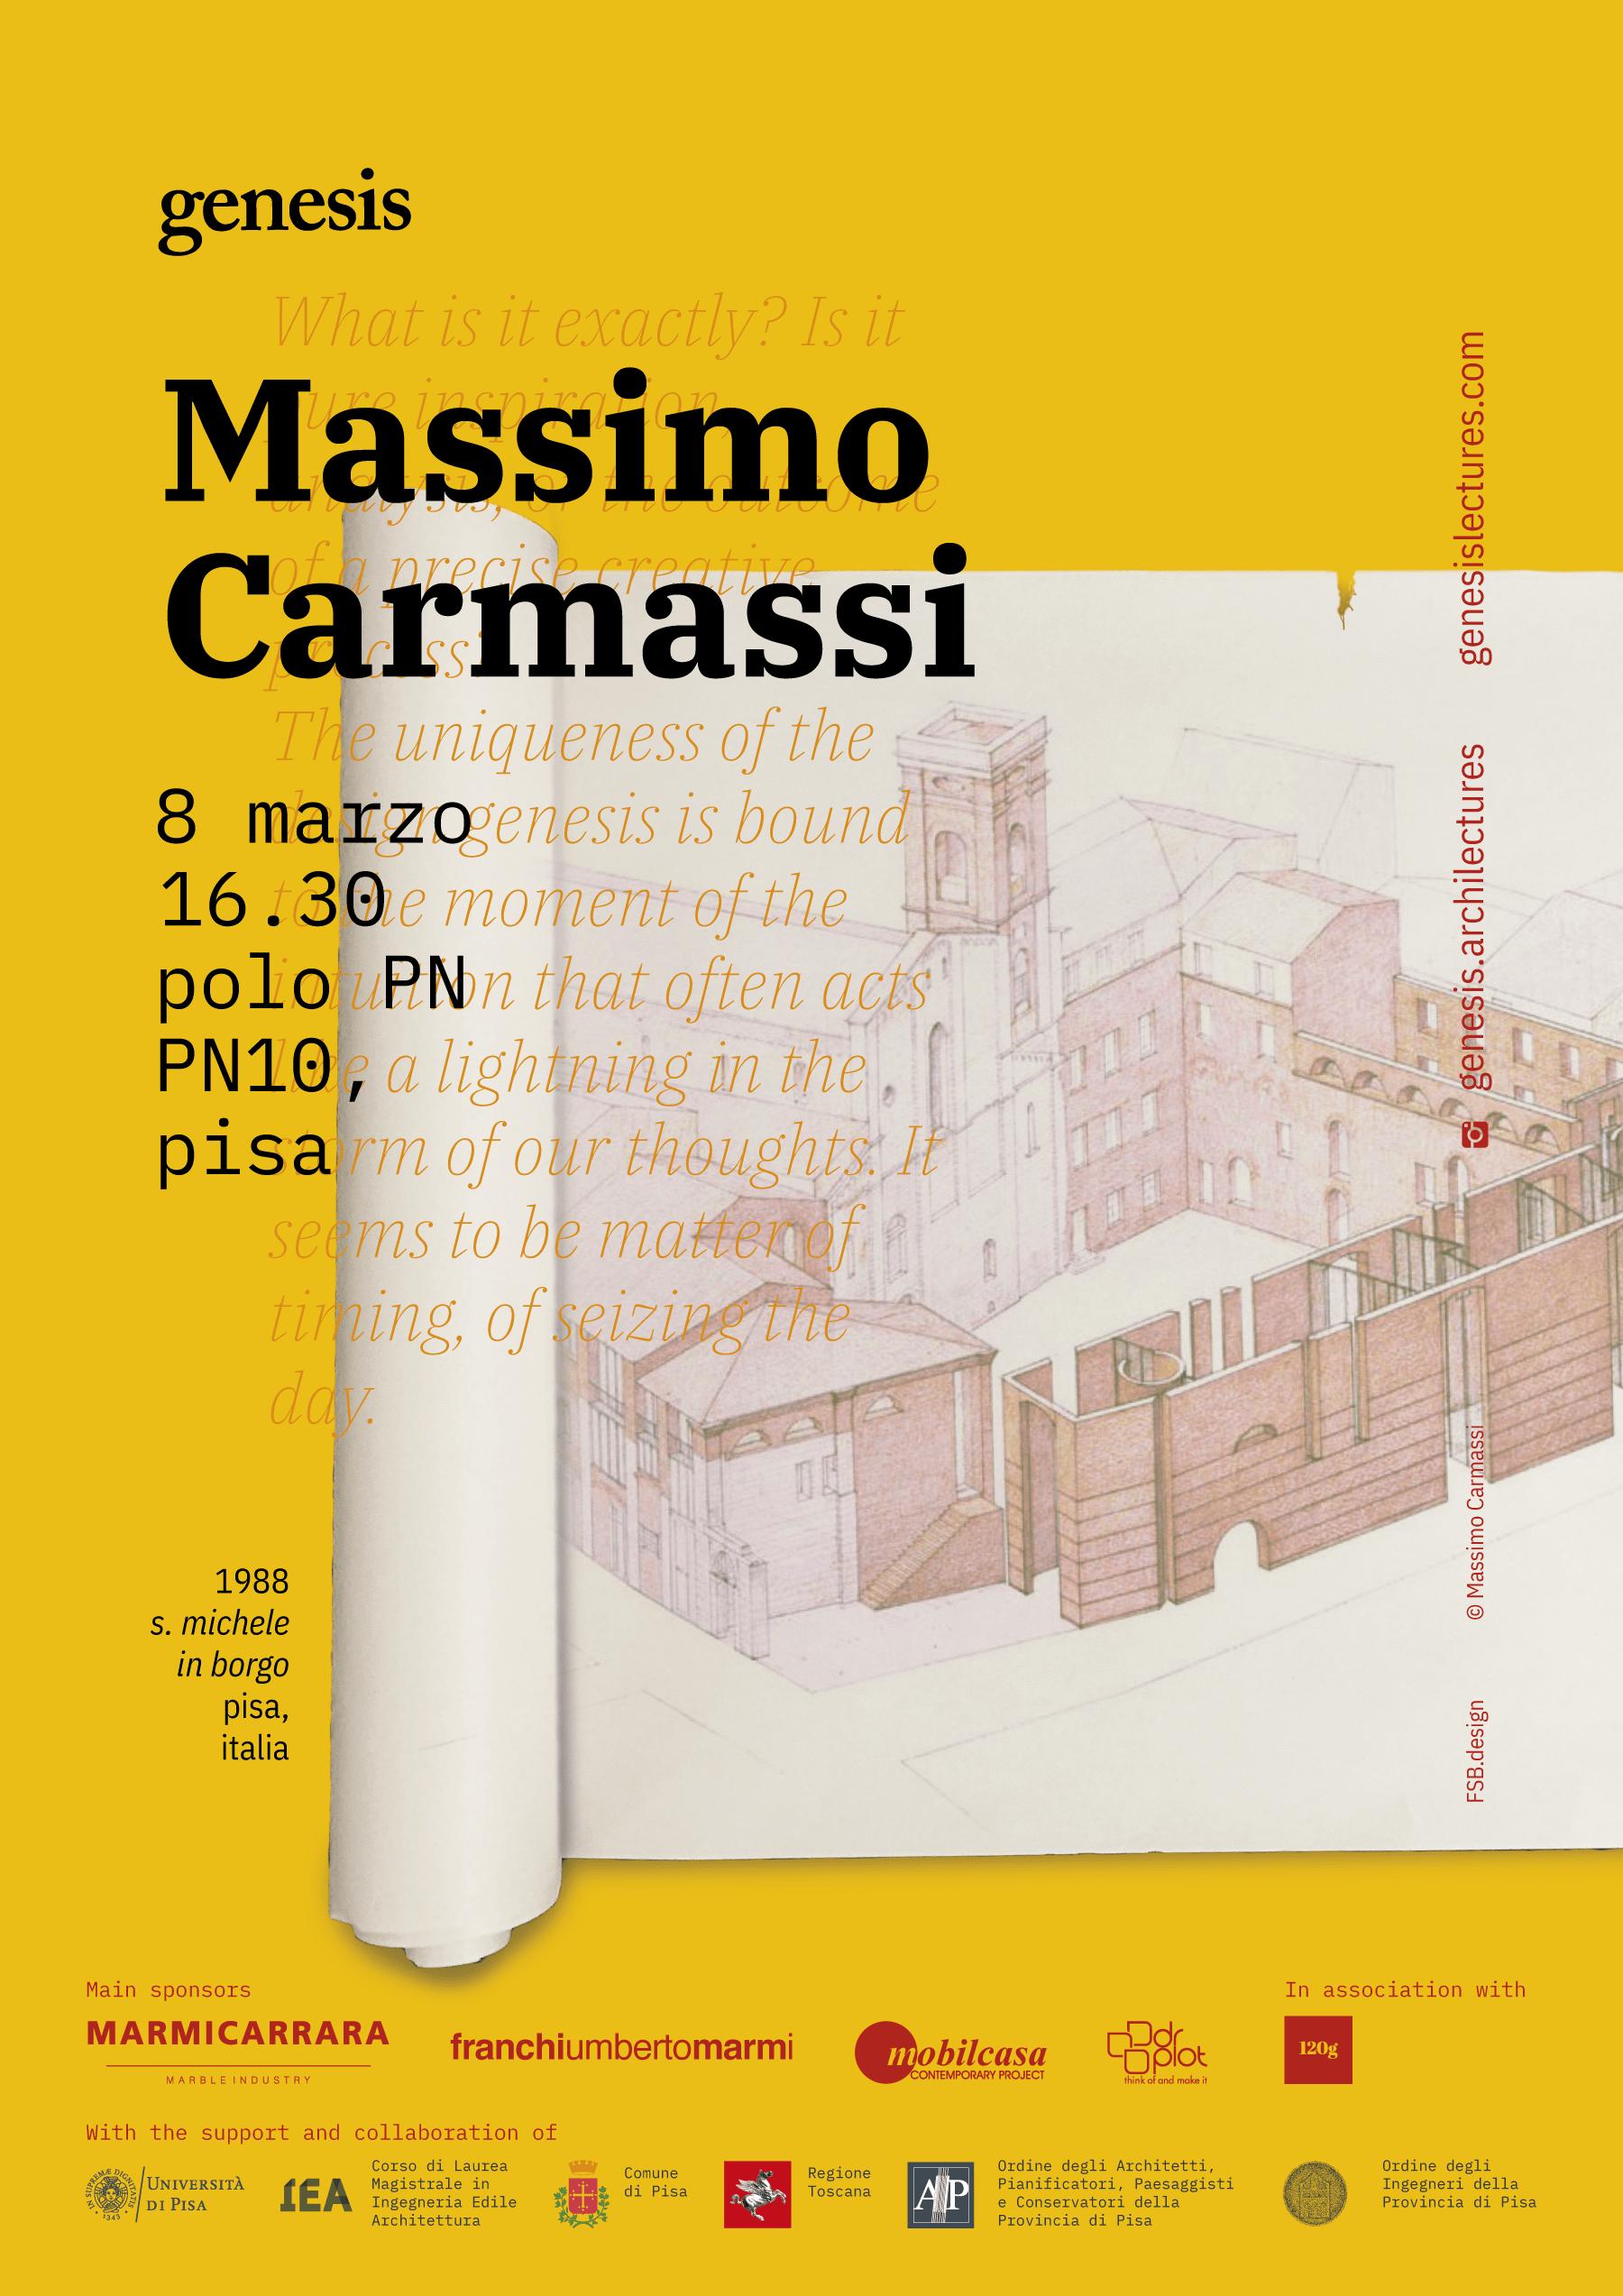 Massimo Carmassi at Genesis Lectures 2019